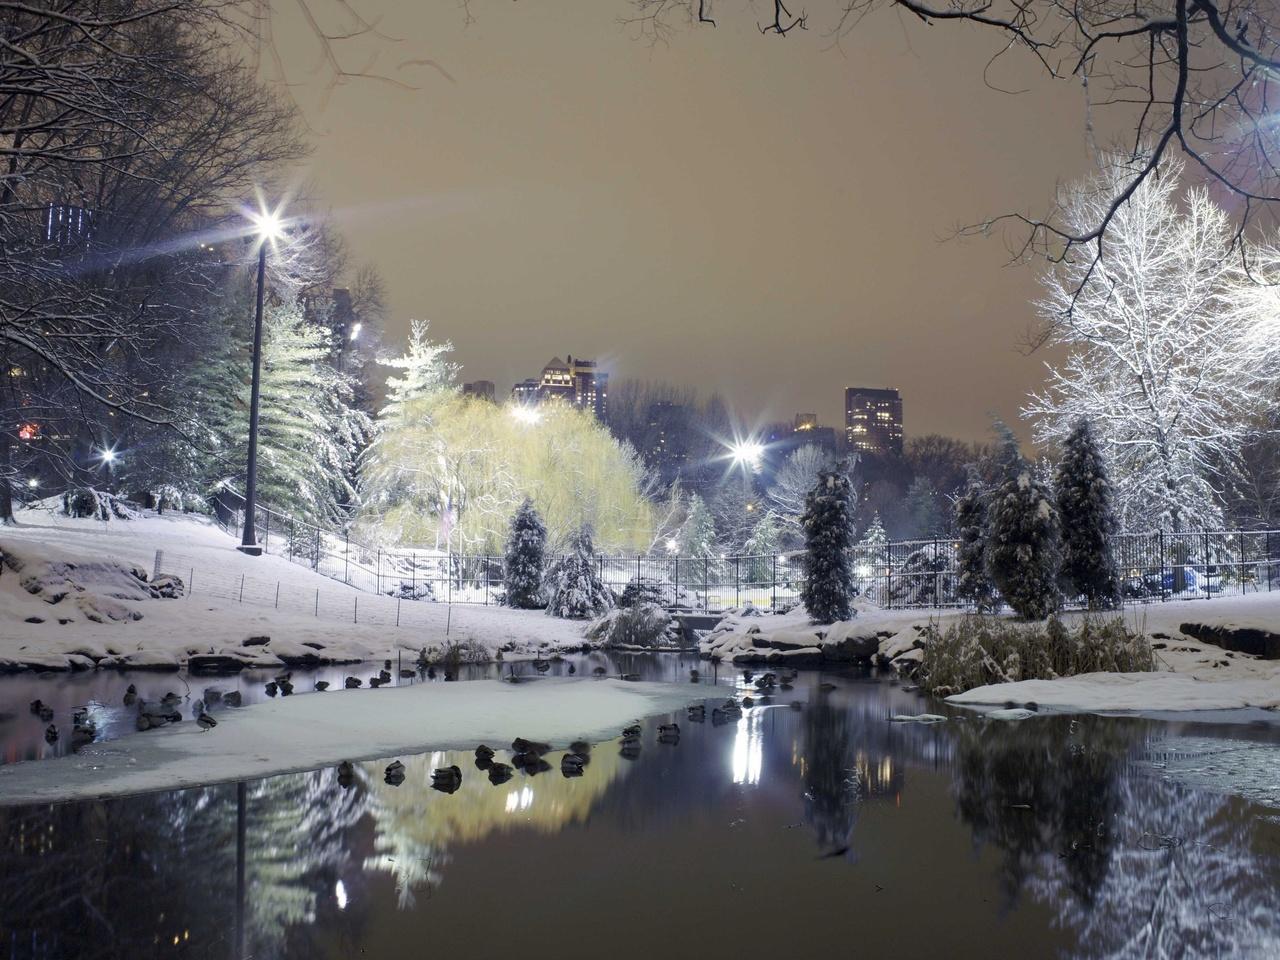 деревья, ставок, парк, фонари, зима, Город, снег